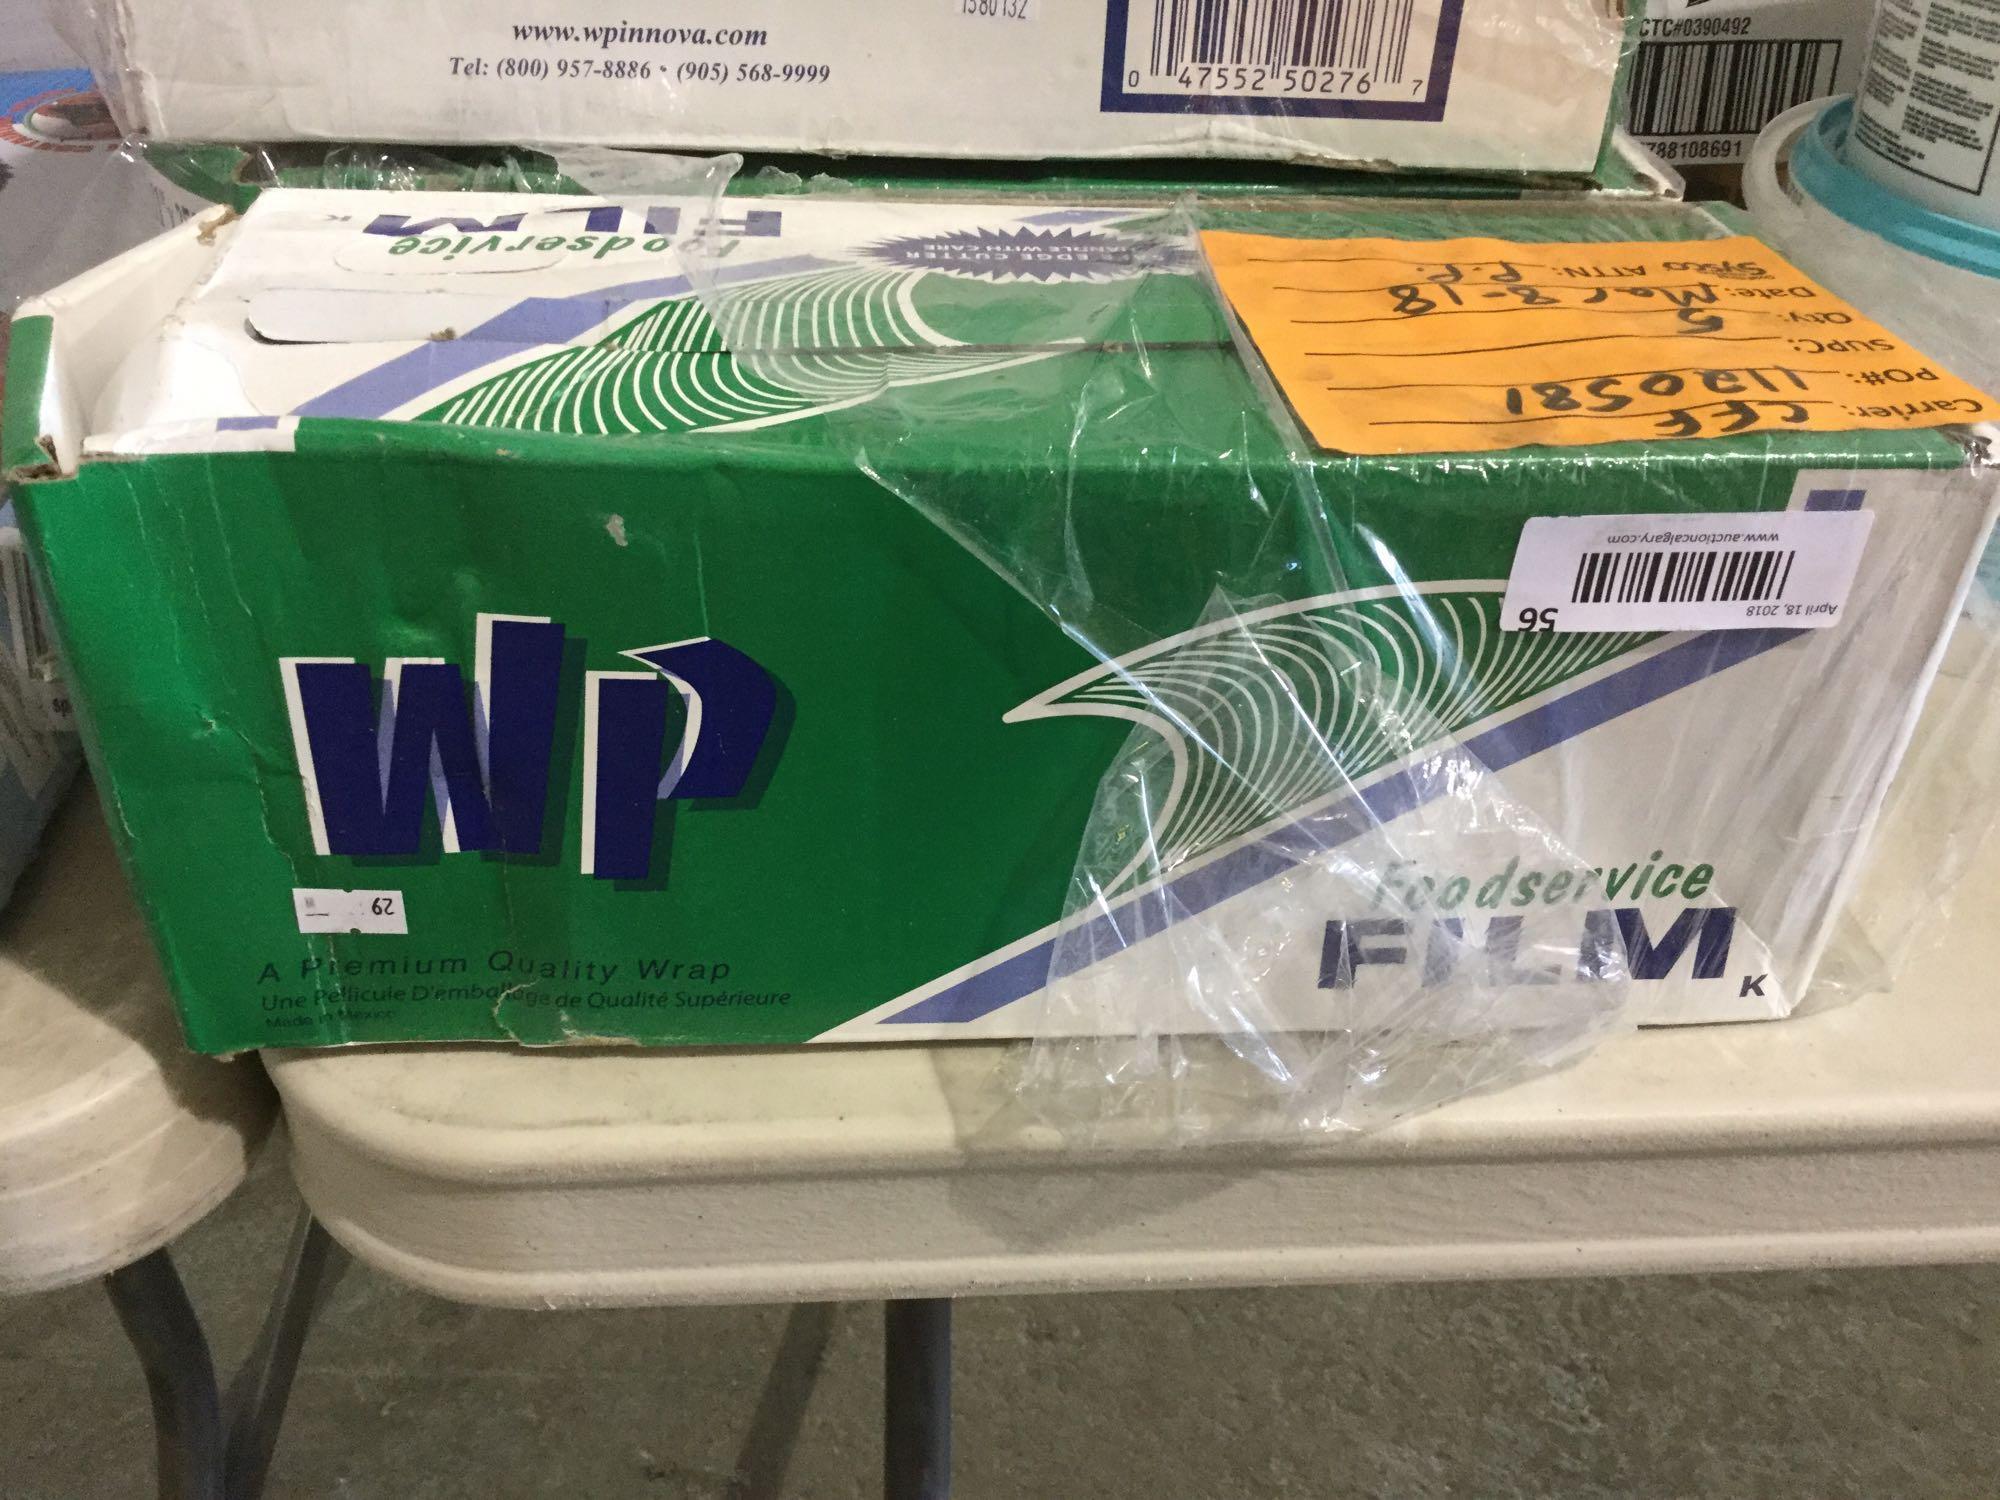 "Lot 56 - WP Foodservice Film 11"" x 2500"" - Premium Quality Wrap"